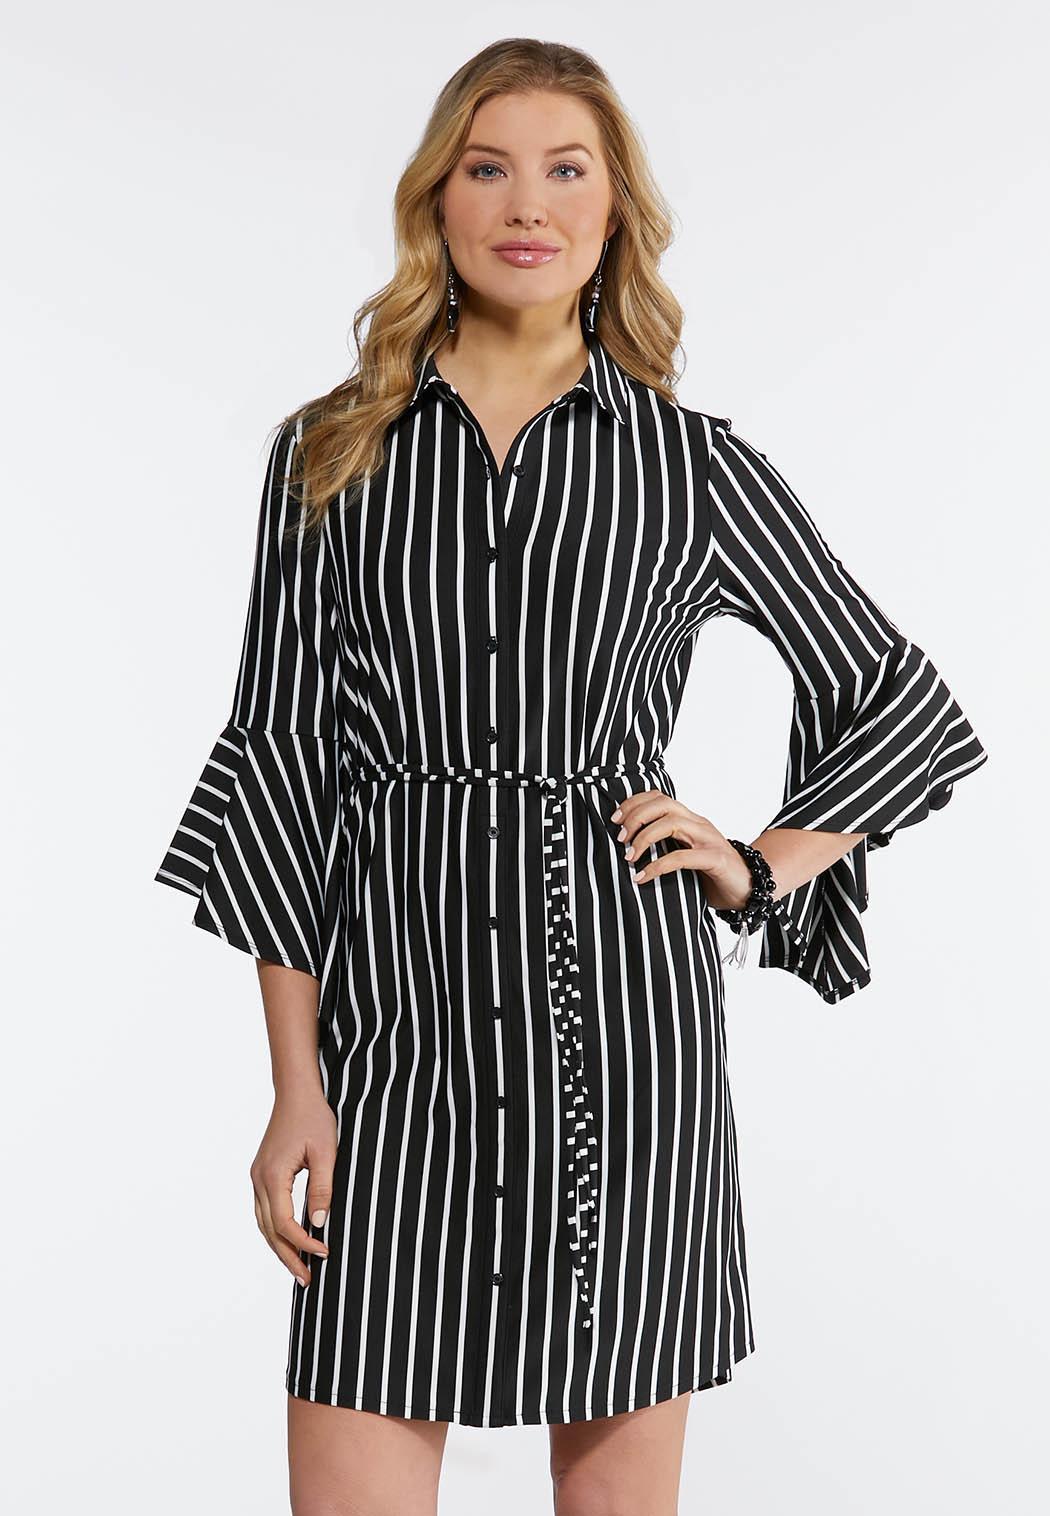 d4051b6ee1 Plus Size Stripe Flounced Shirt Dress Plus Sizes Cato Fashions